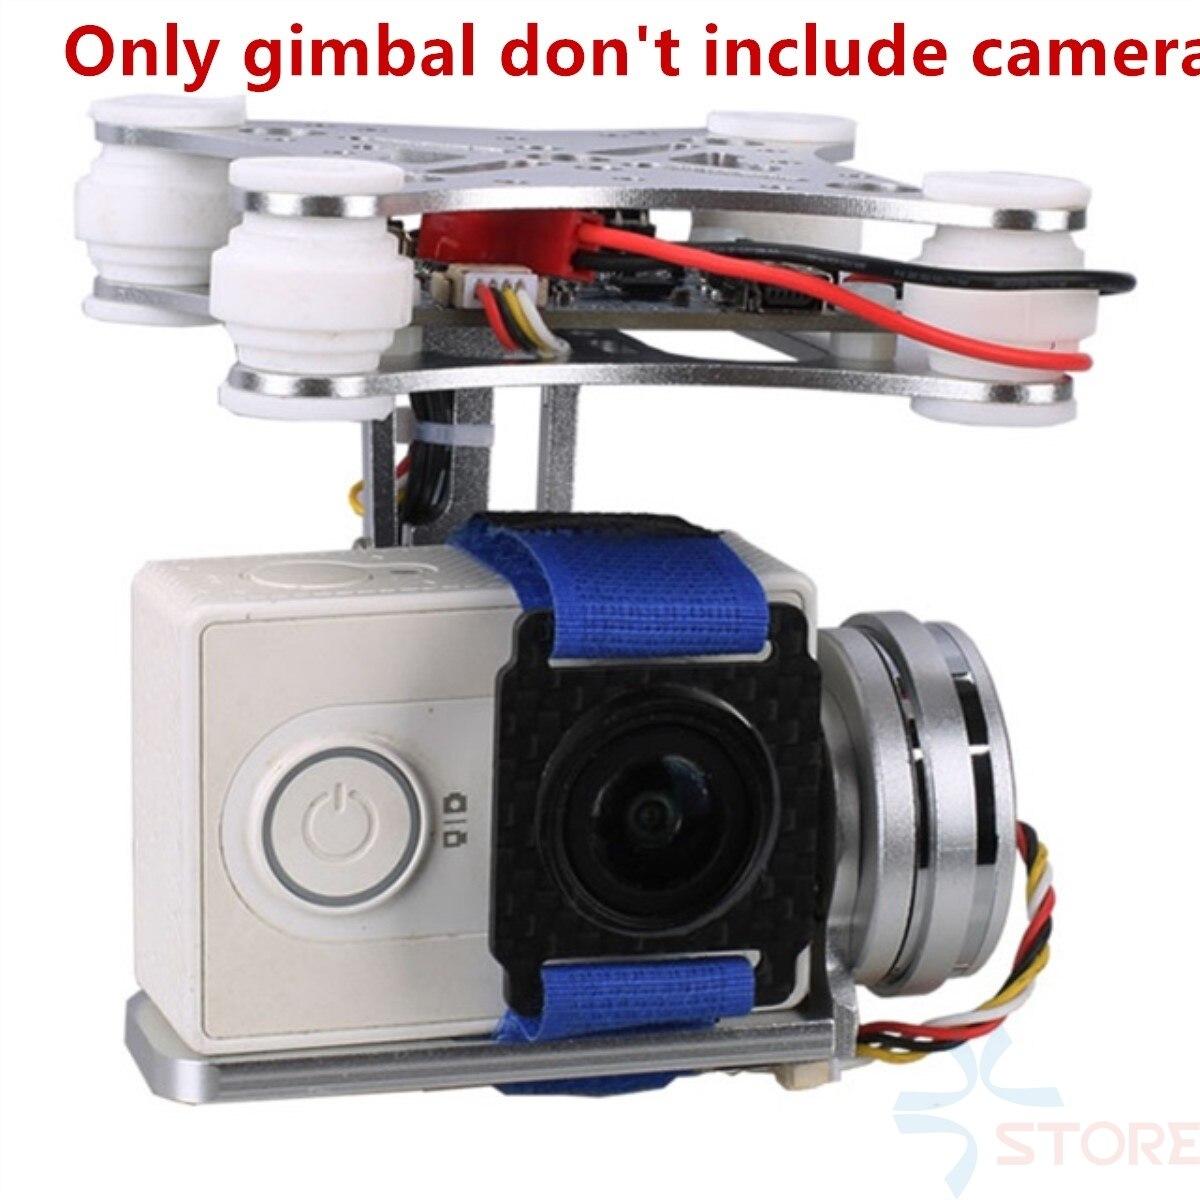 2 Aixs 2D Brushless Kameraausrichtung für Gopro SJCAM XIAOMI YI Action Kamera Eken F450 F550 S500 FPV Drone Multirotor Quadrocopter